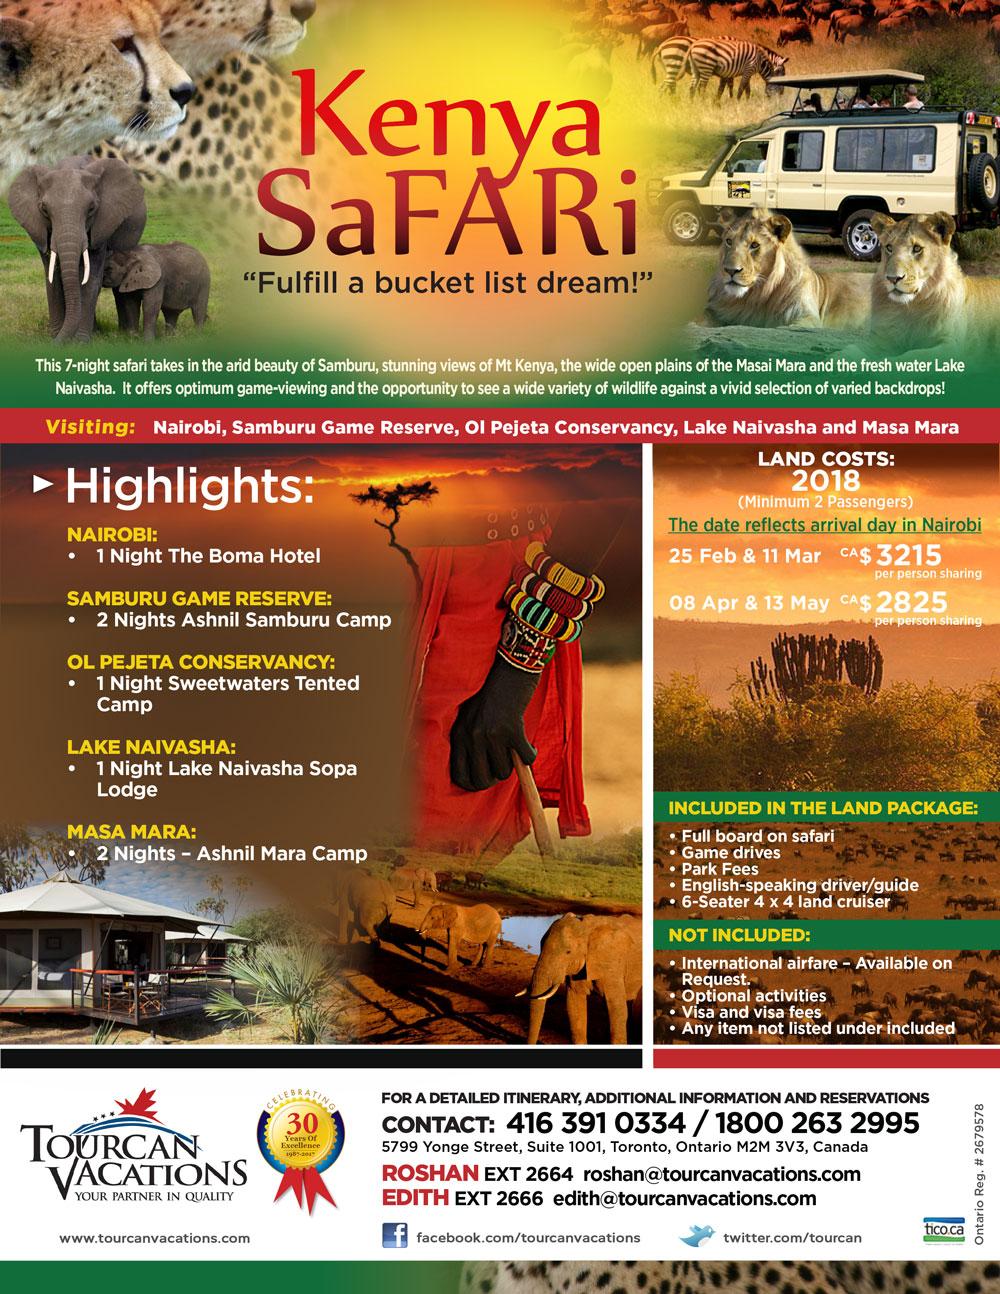 tourcan-2017-promo-africa-kenya-safari-WEB-1